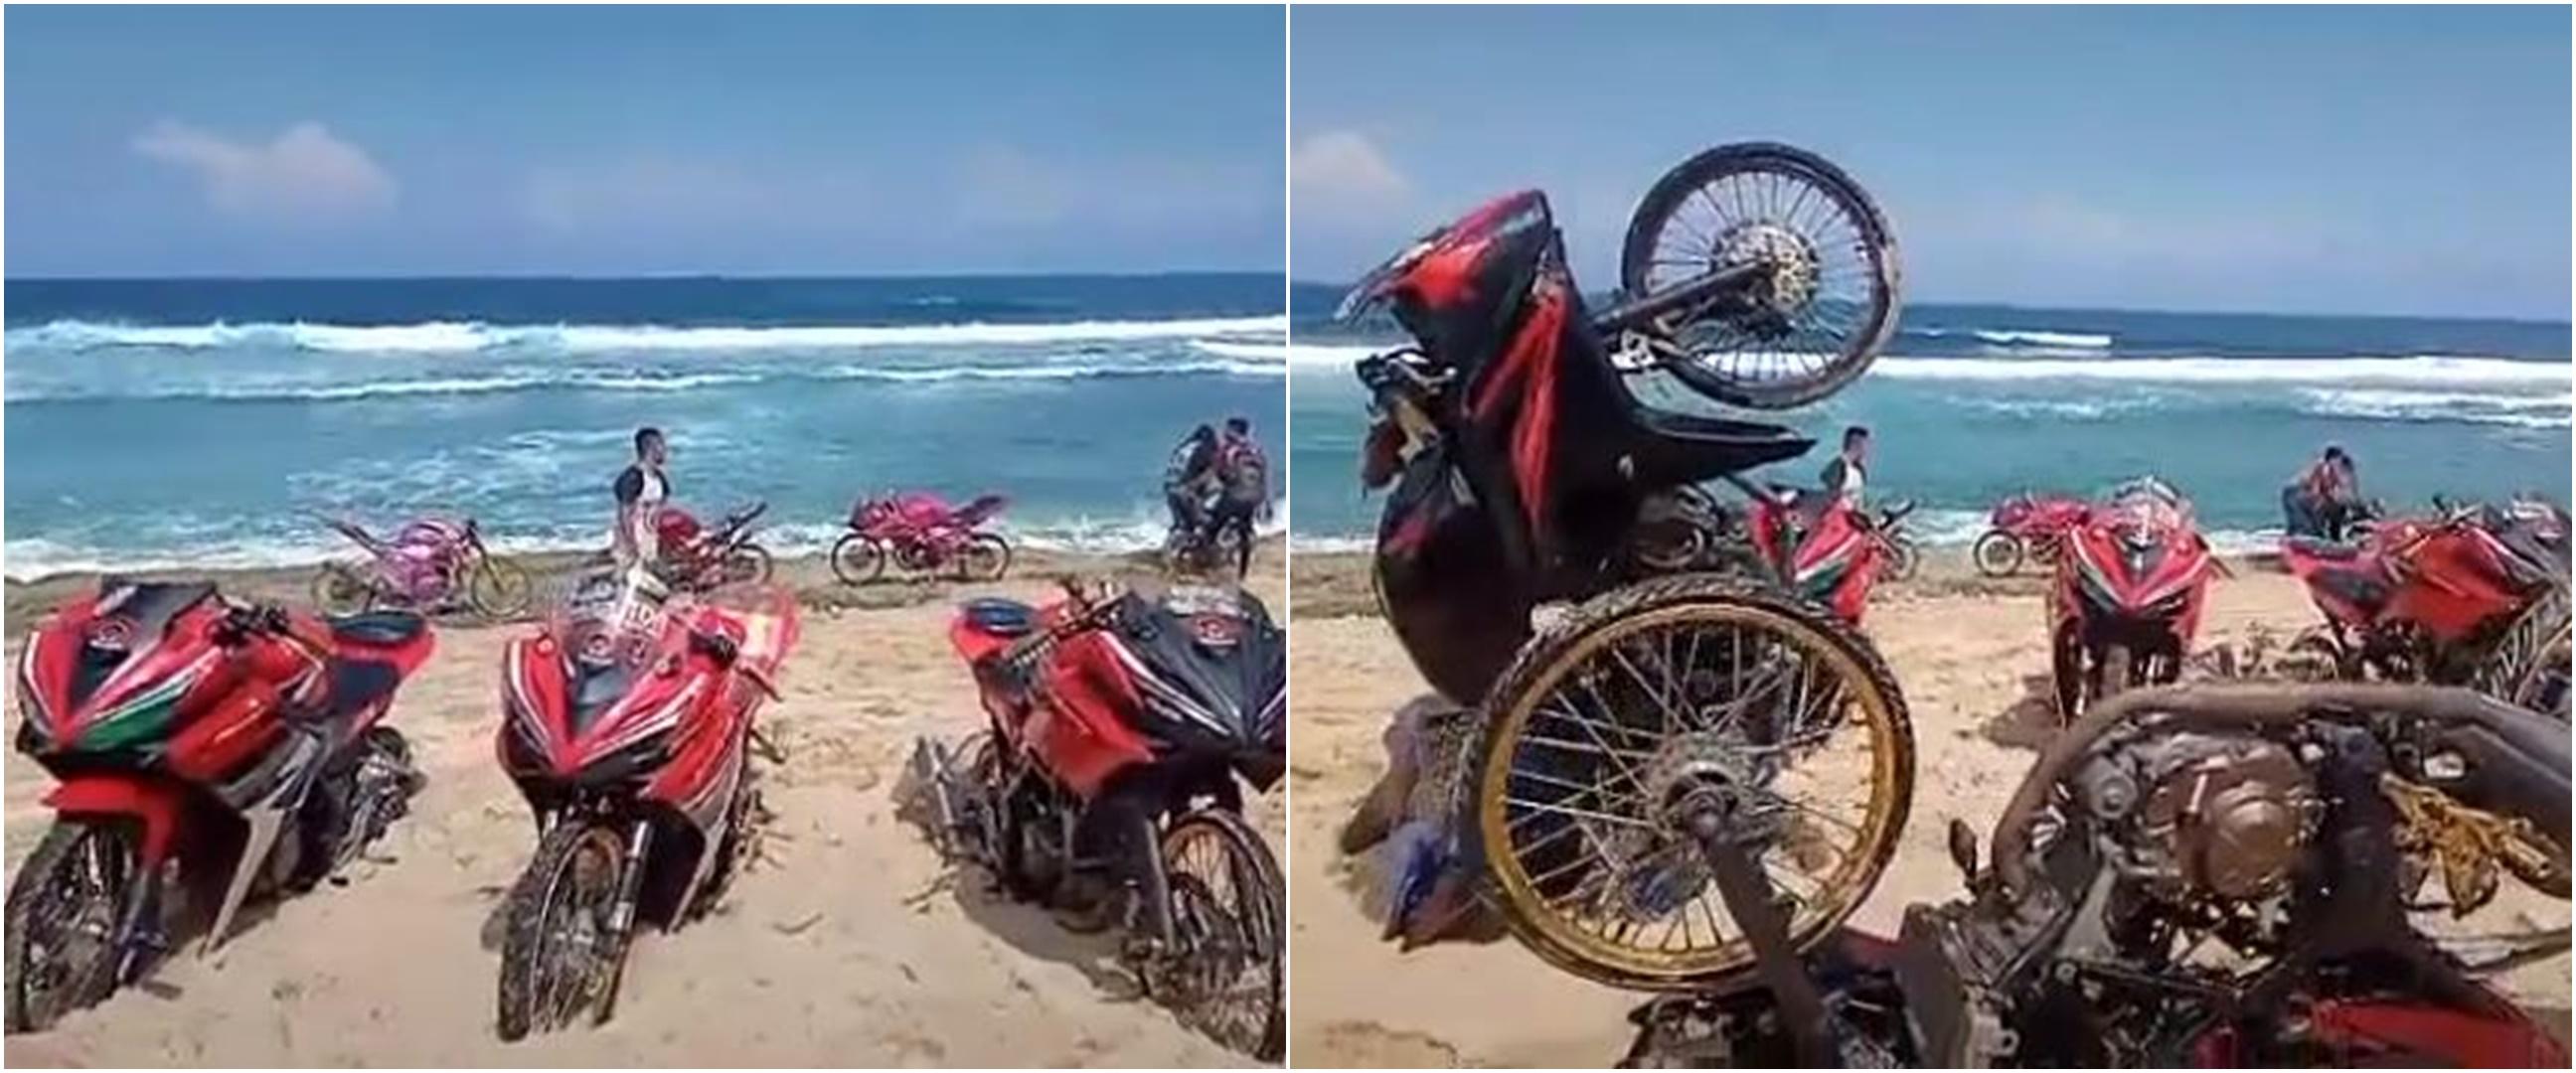 Tanam kendaraannya di pantai, aksi anak motor ini bikin geleng kepala